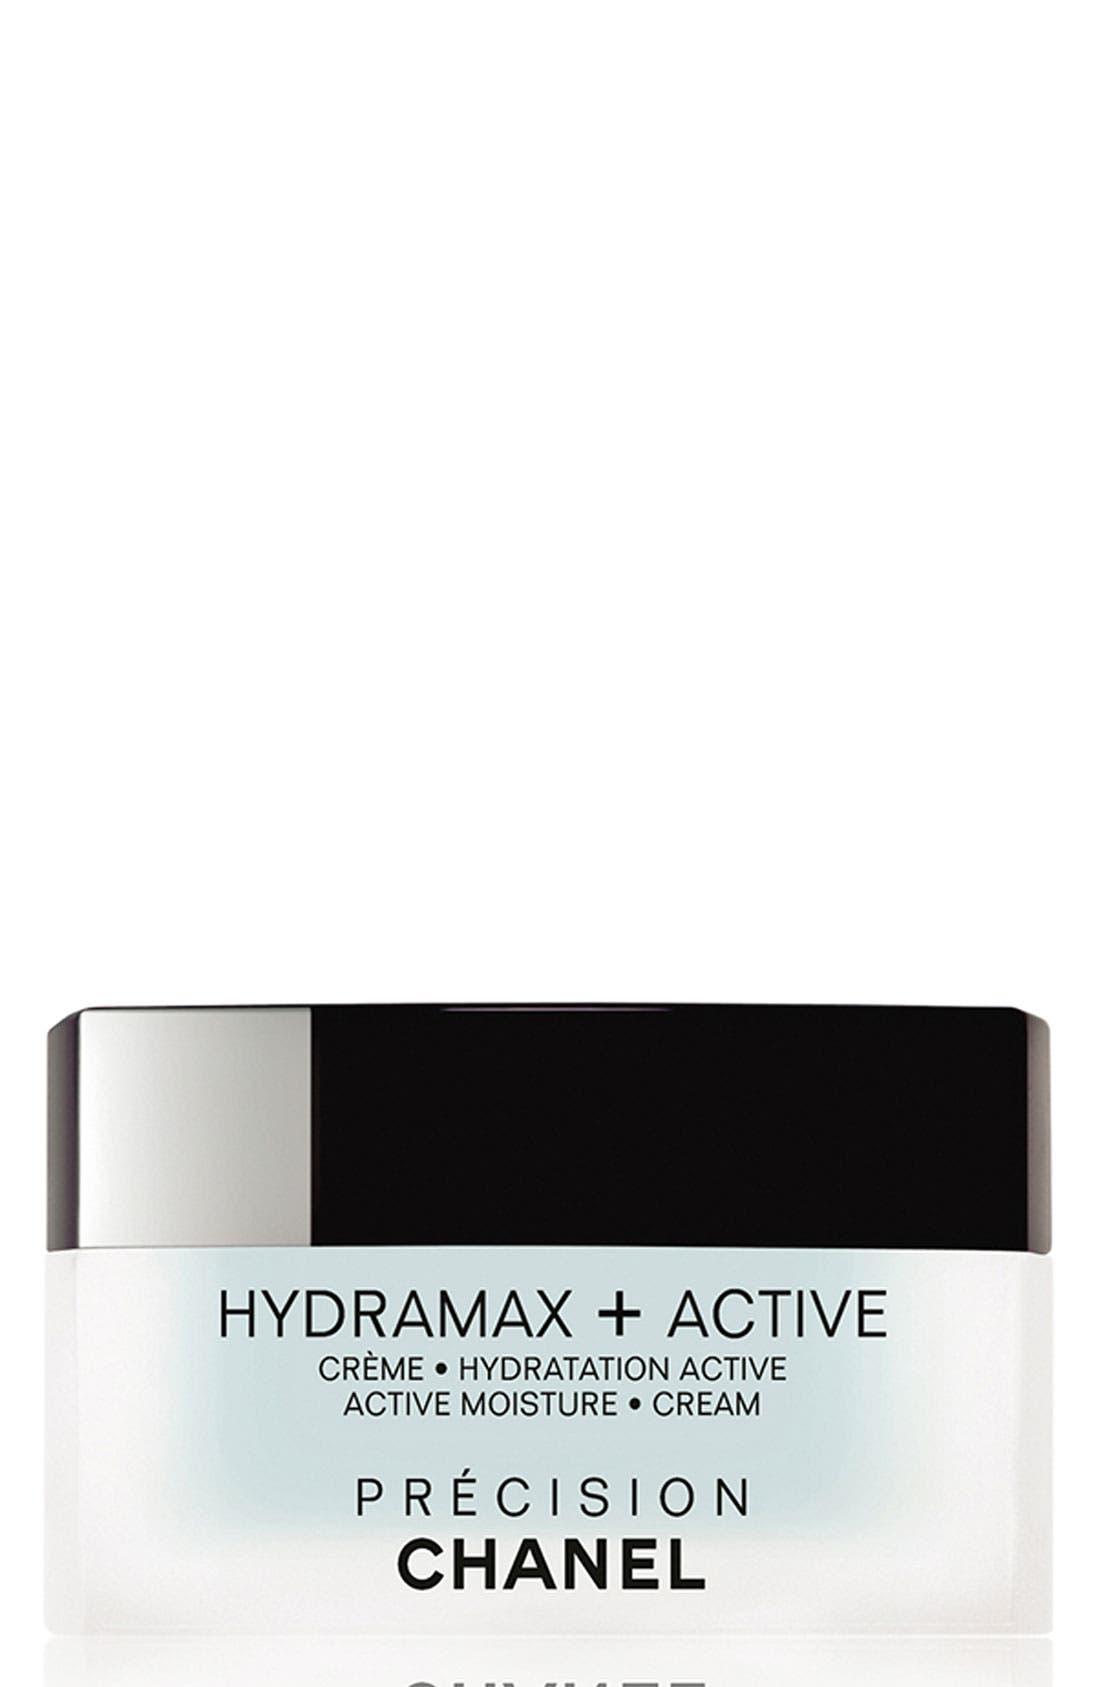 HYDRAMAX + ACTIVE CRÈME HYDRATION ACTIVE ACTIVE MOISTURE CREAM,                             Main thumbnail 1, color,                             000